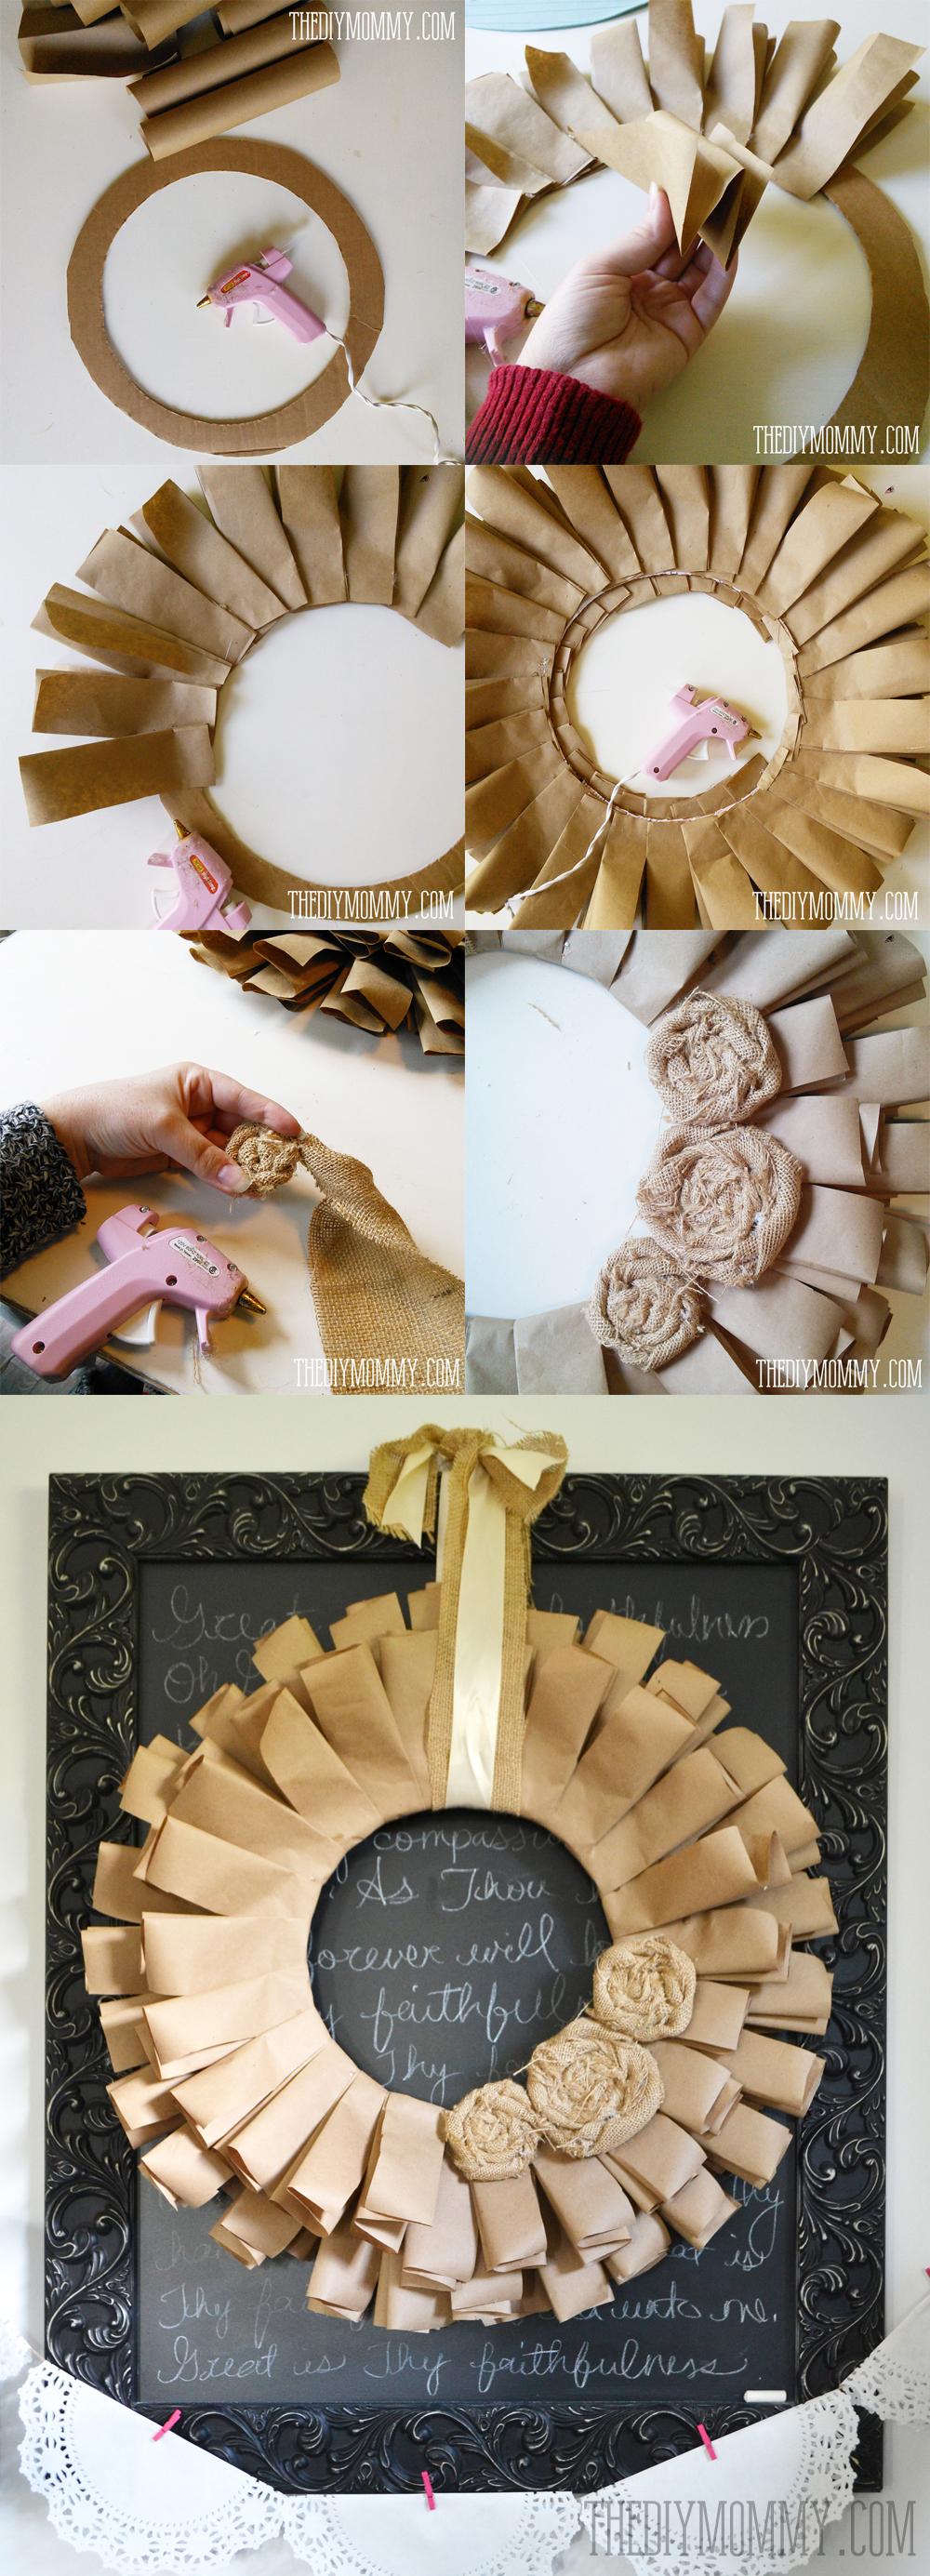 DIY Recycled Brown Paper & Rolled Burlap Roses Fall Wreath